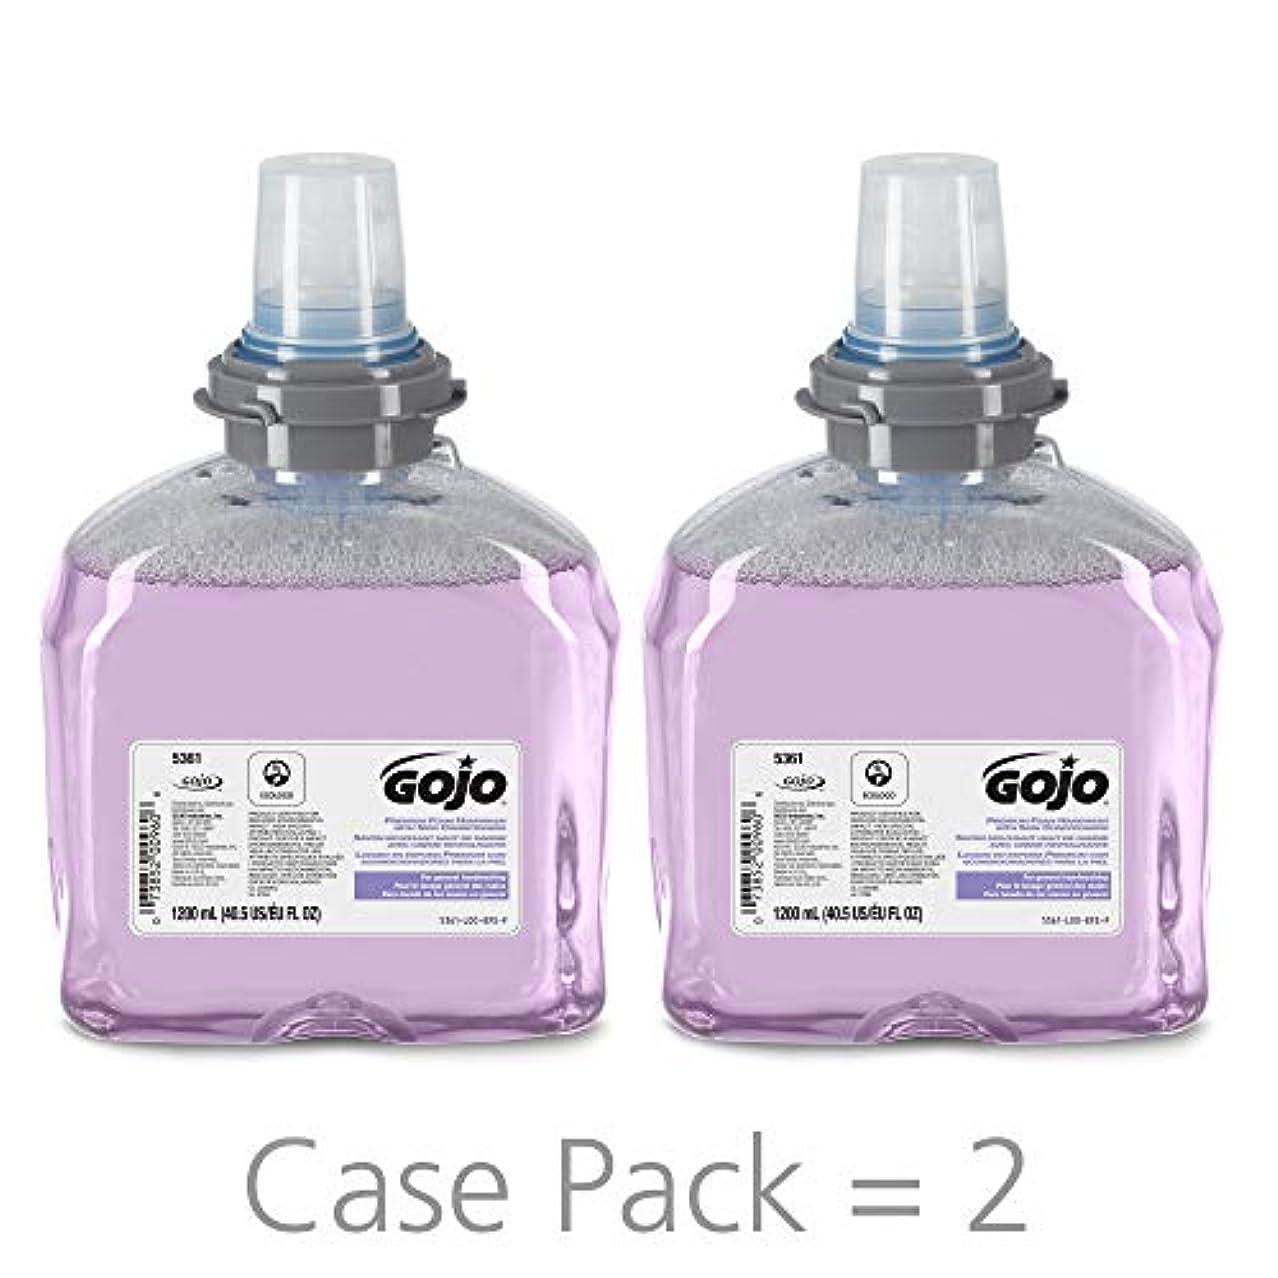 TFX Luxury Foam Hand Wash, Cranberry, Dispenser, 1200ml (並行輸入品)